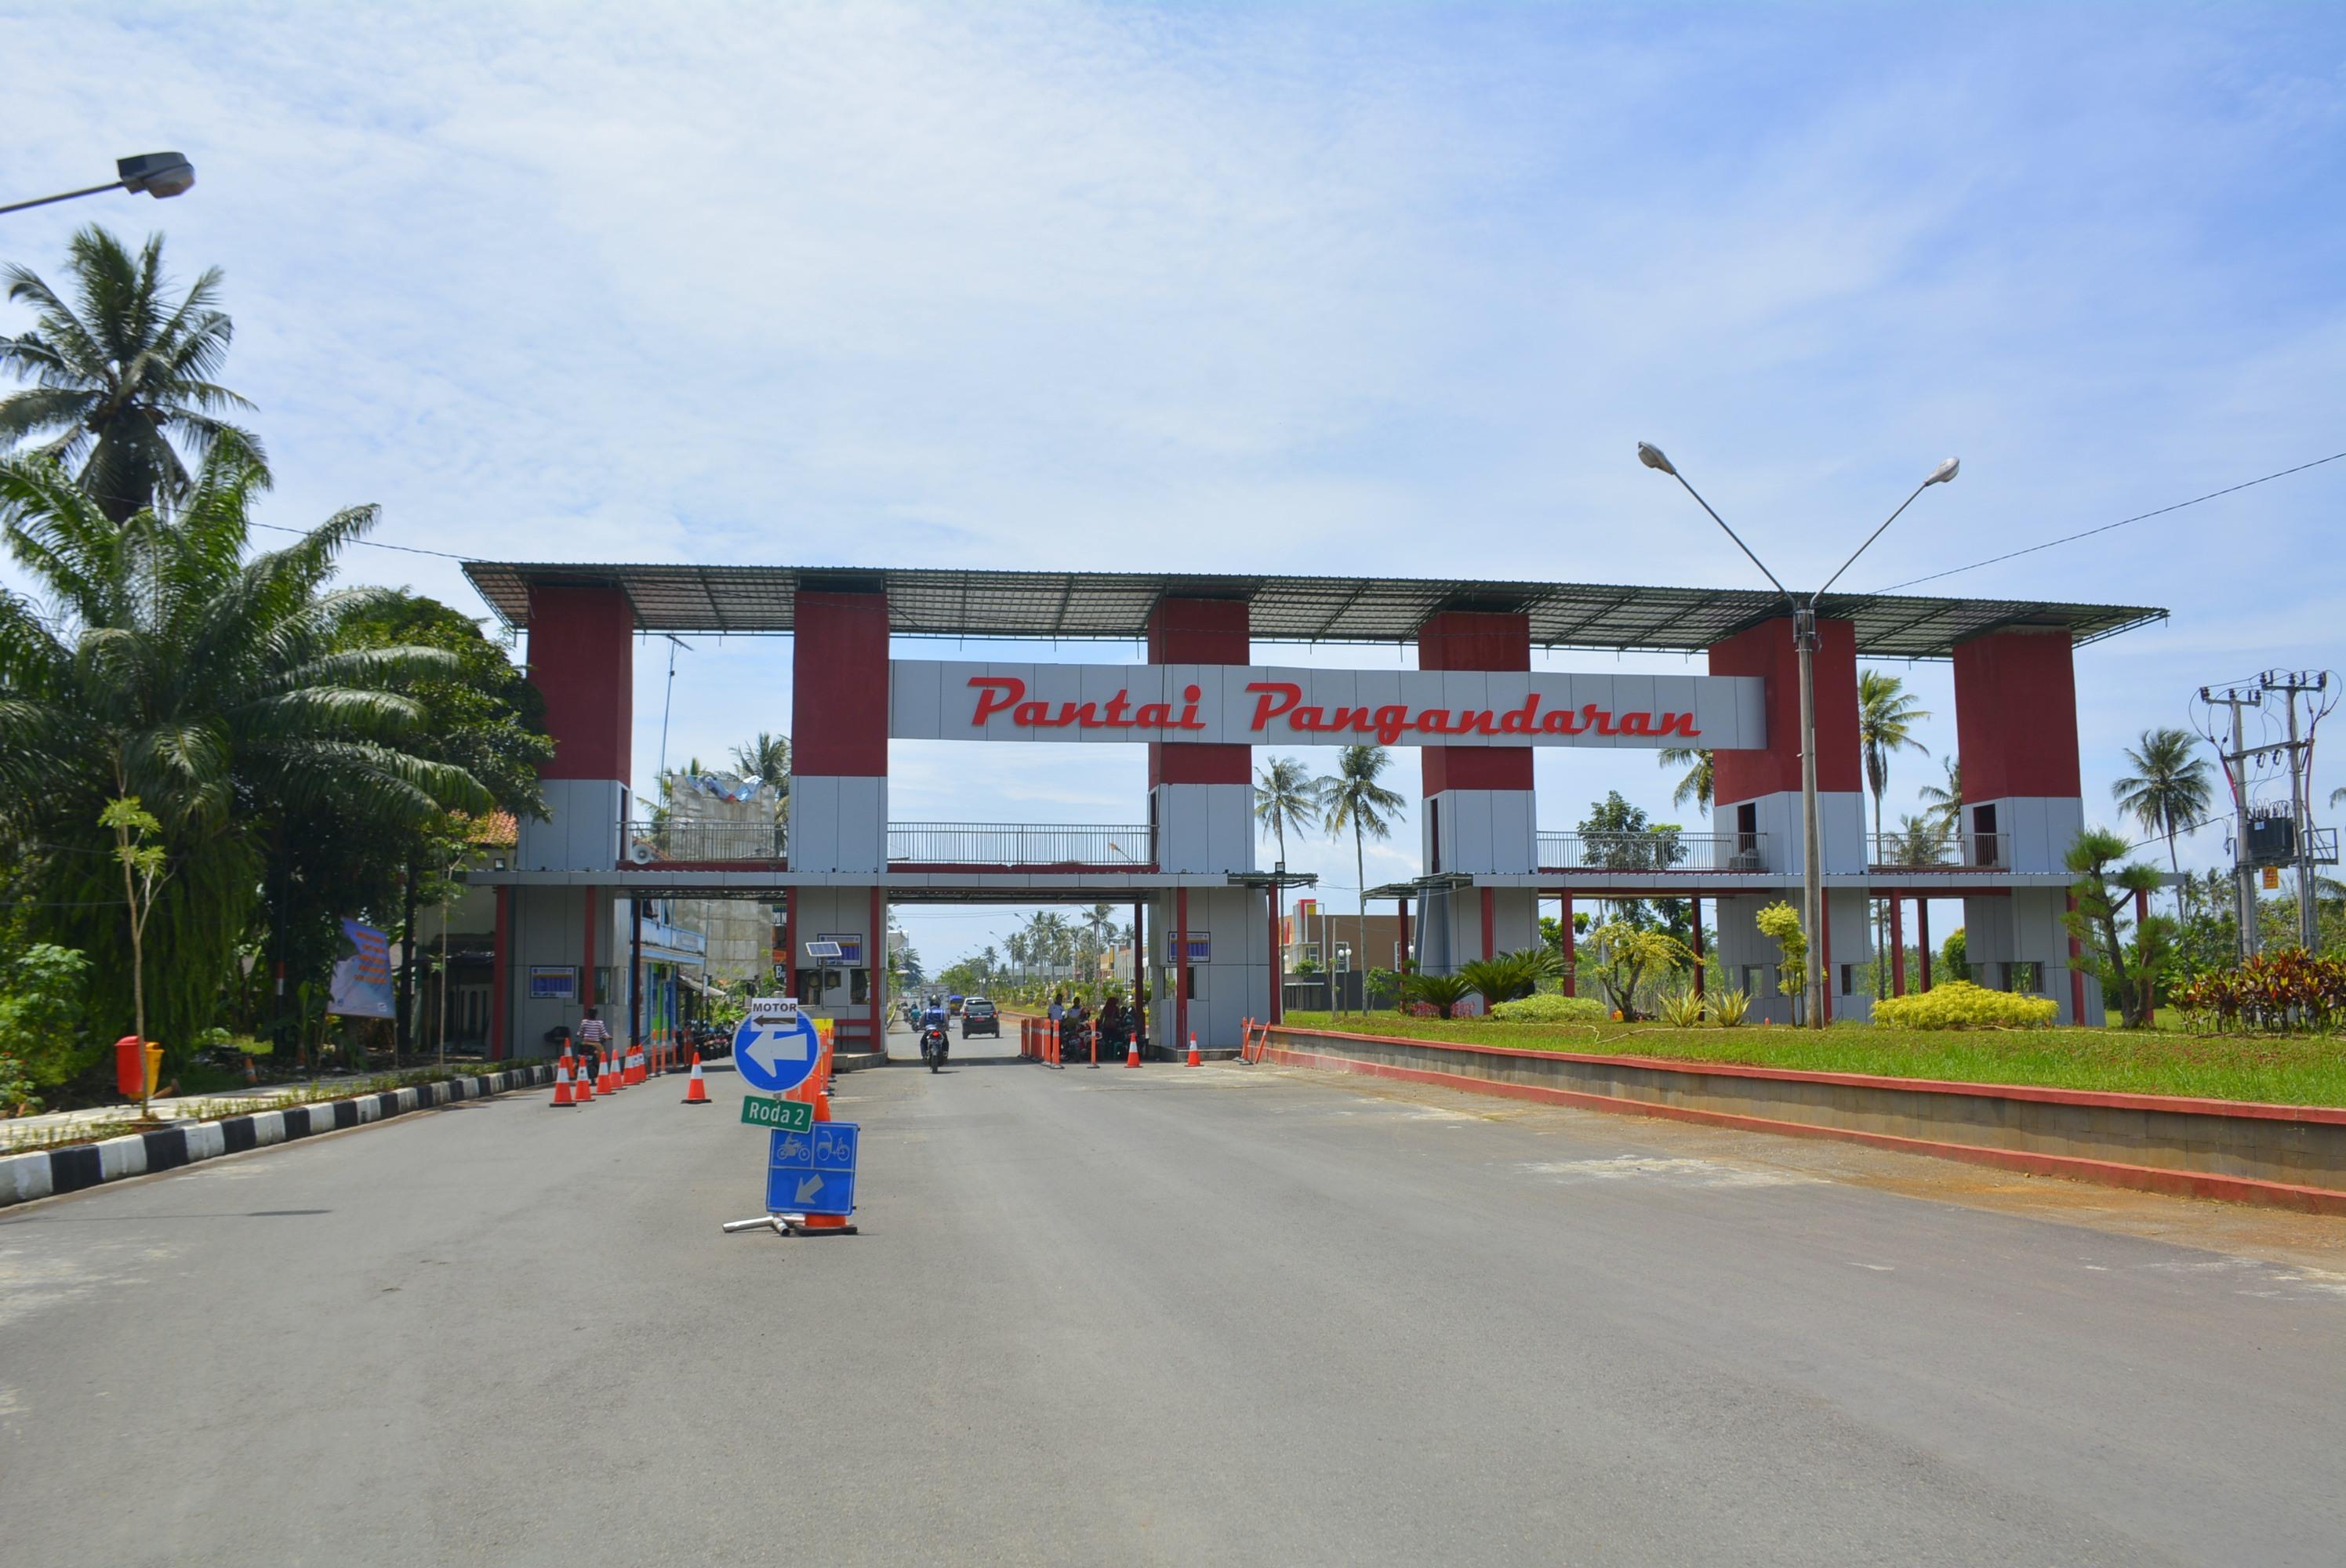 Destinasi Wisata Unggulan Jawa Barat, Pantai Pangandaran Direncanakan Dibuka 5 Juni 2020